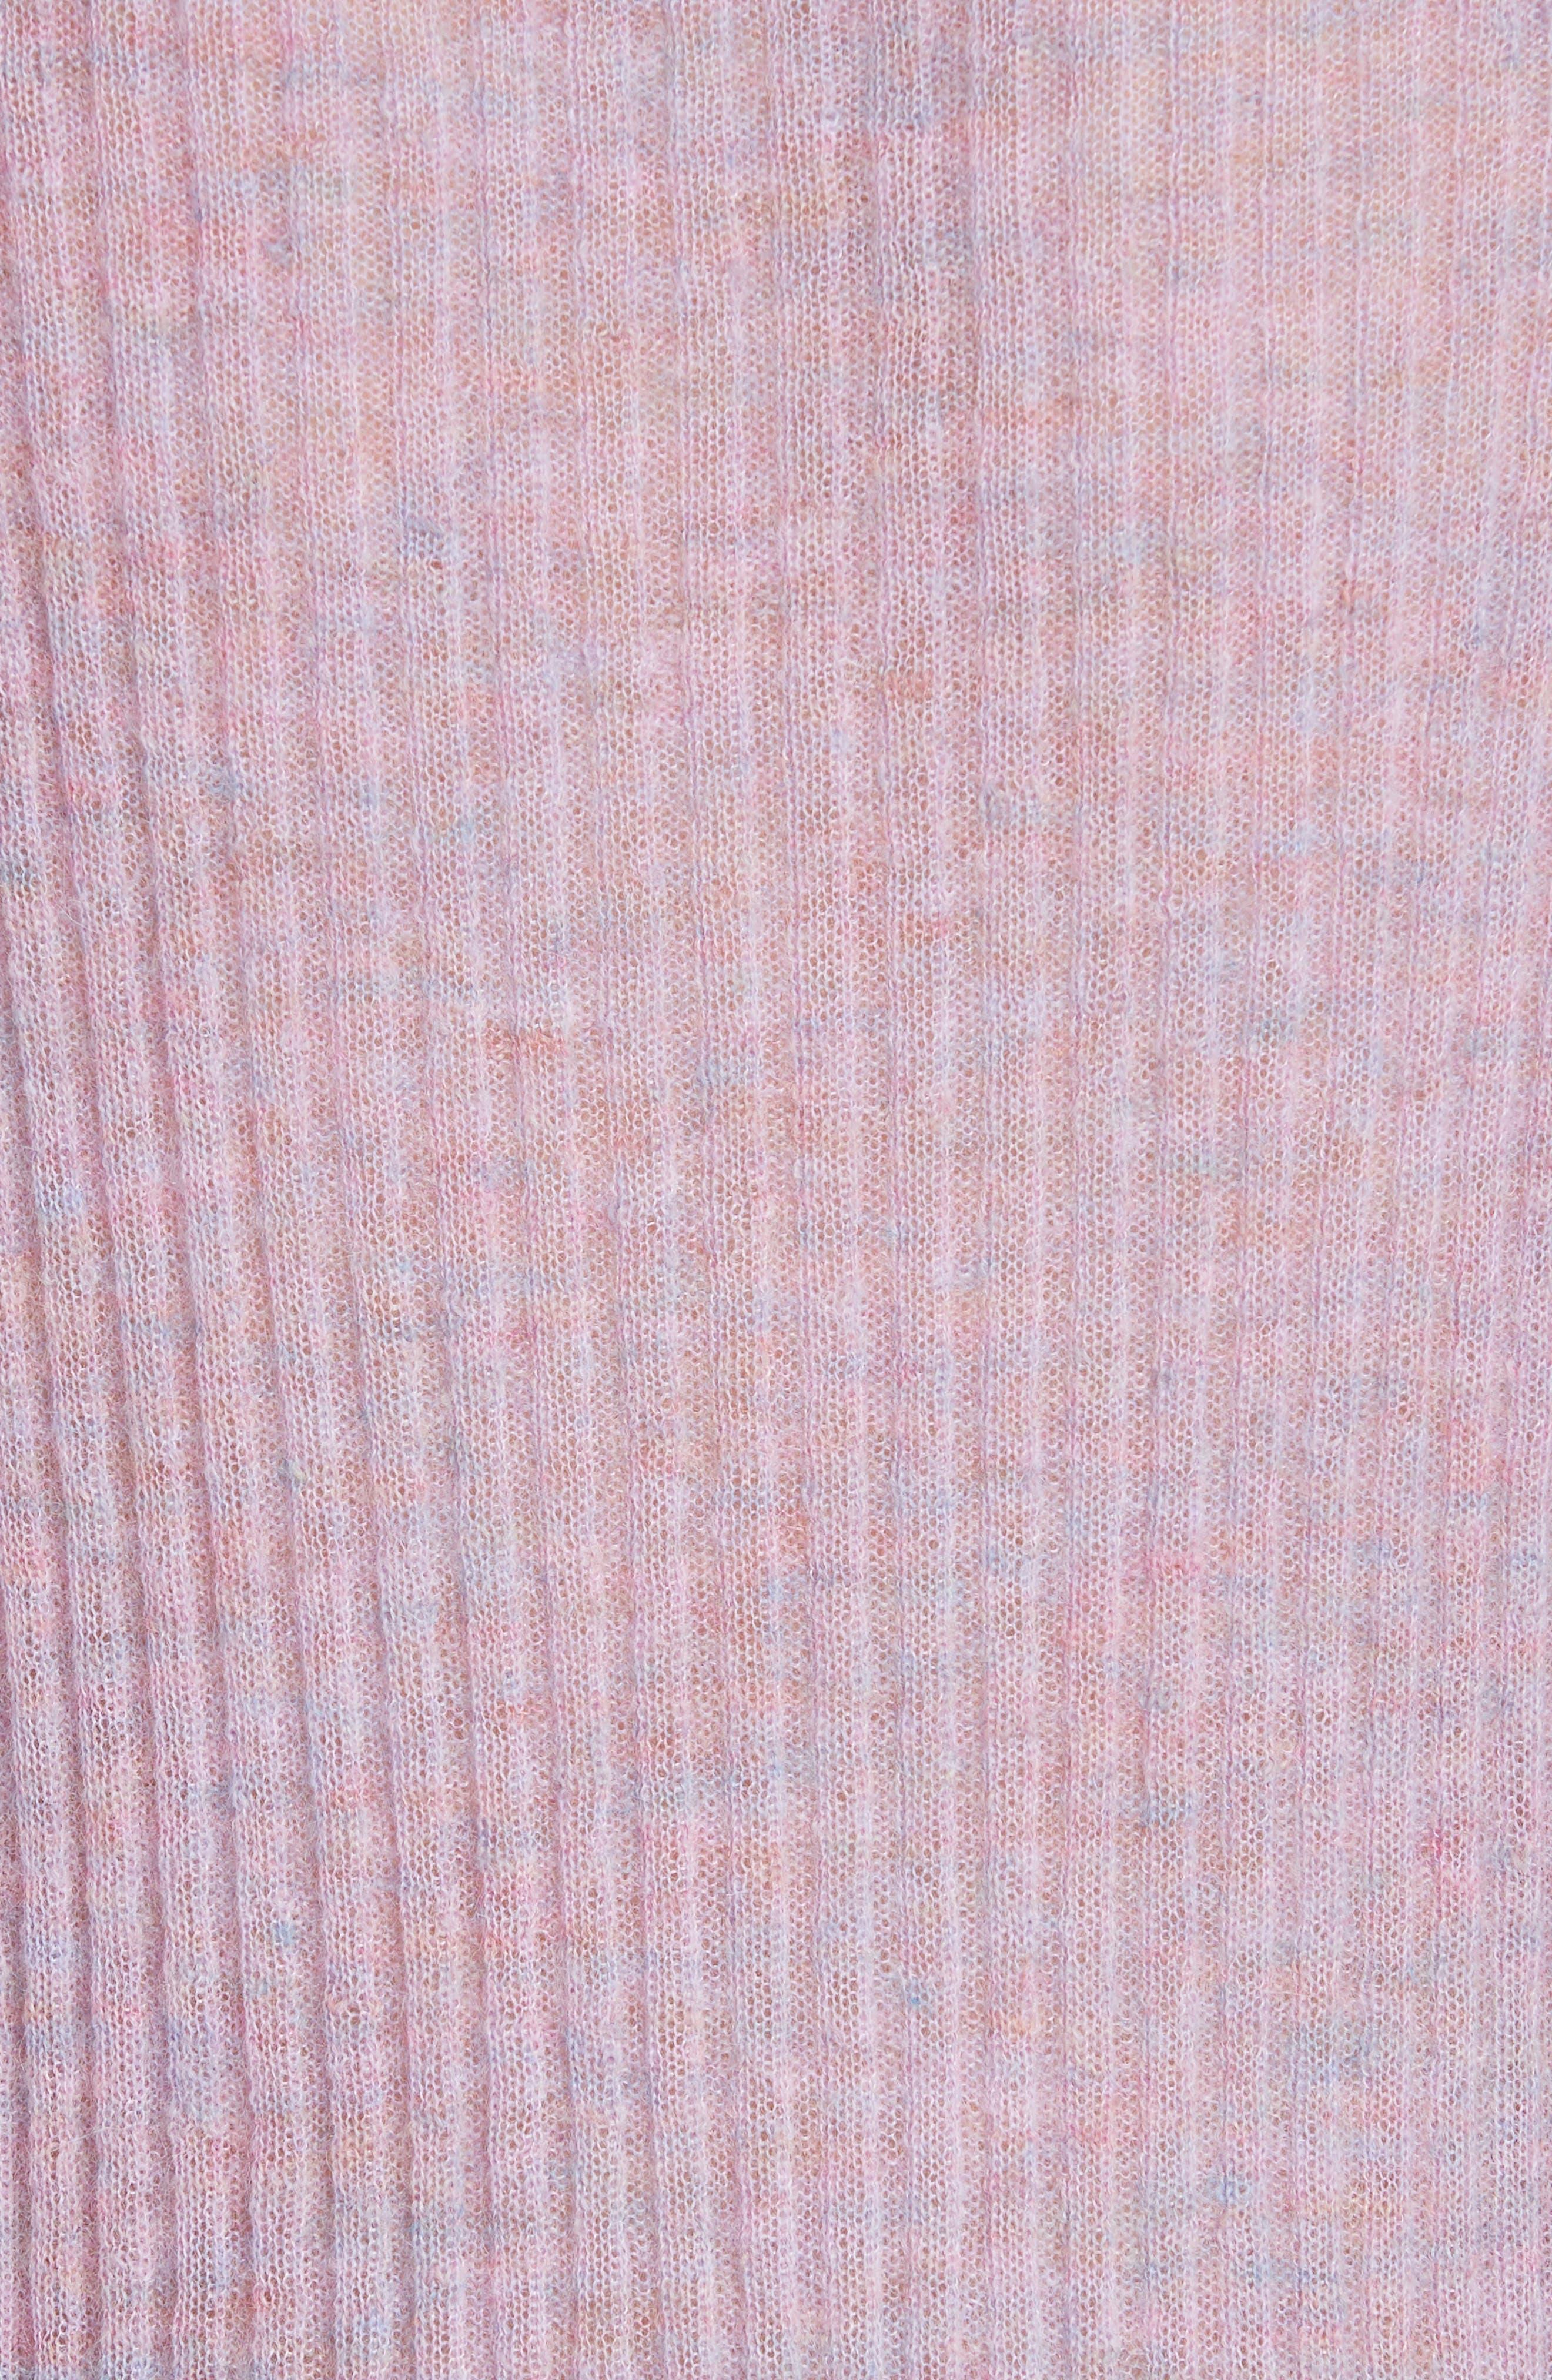 RAG & BONE, Donna Mohair Blend Sweater, Alternate thumbnail 5, color, LILAC